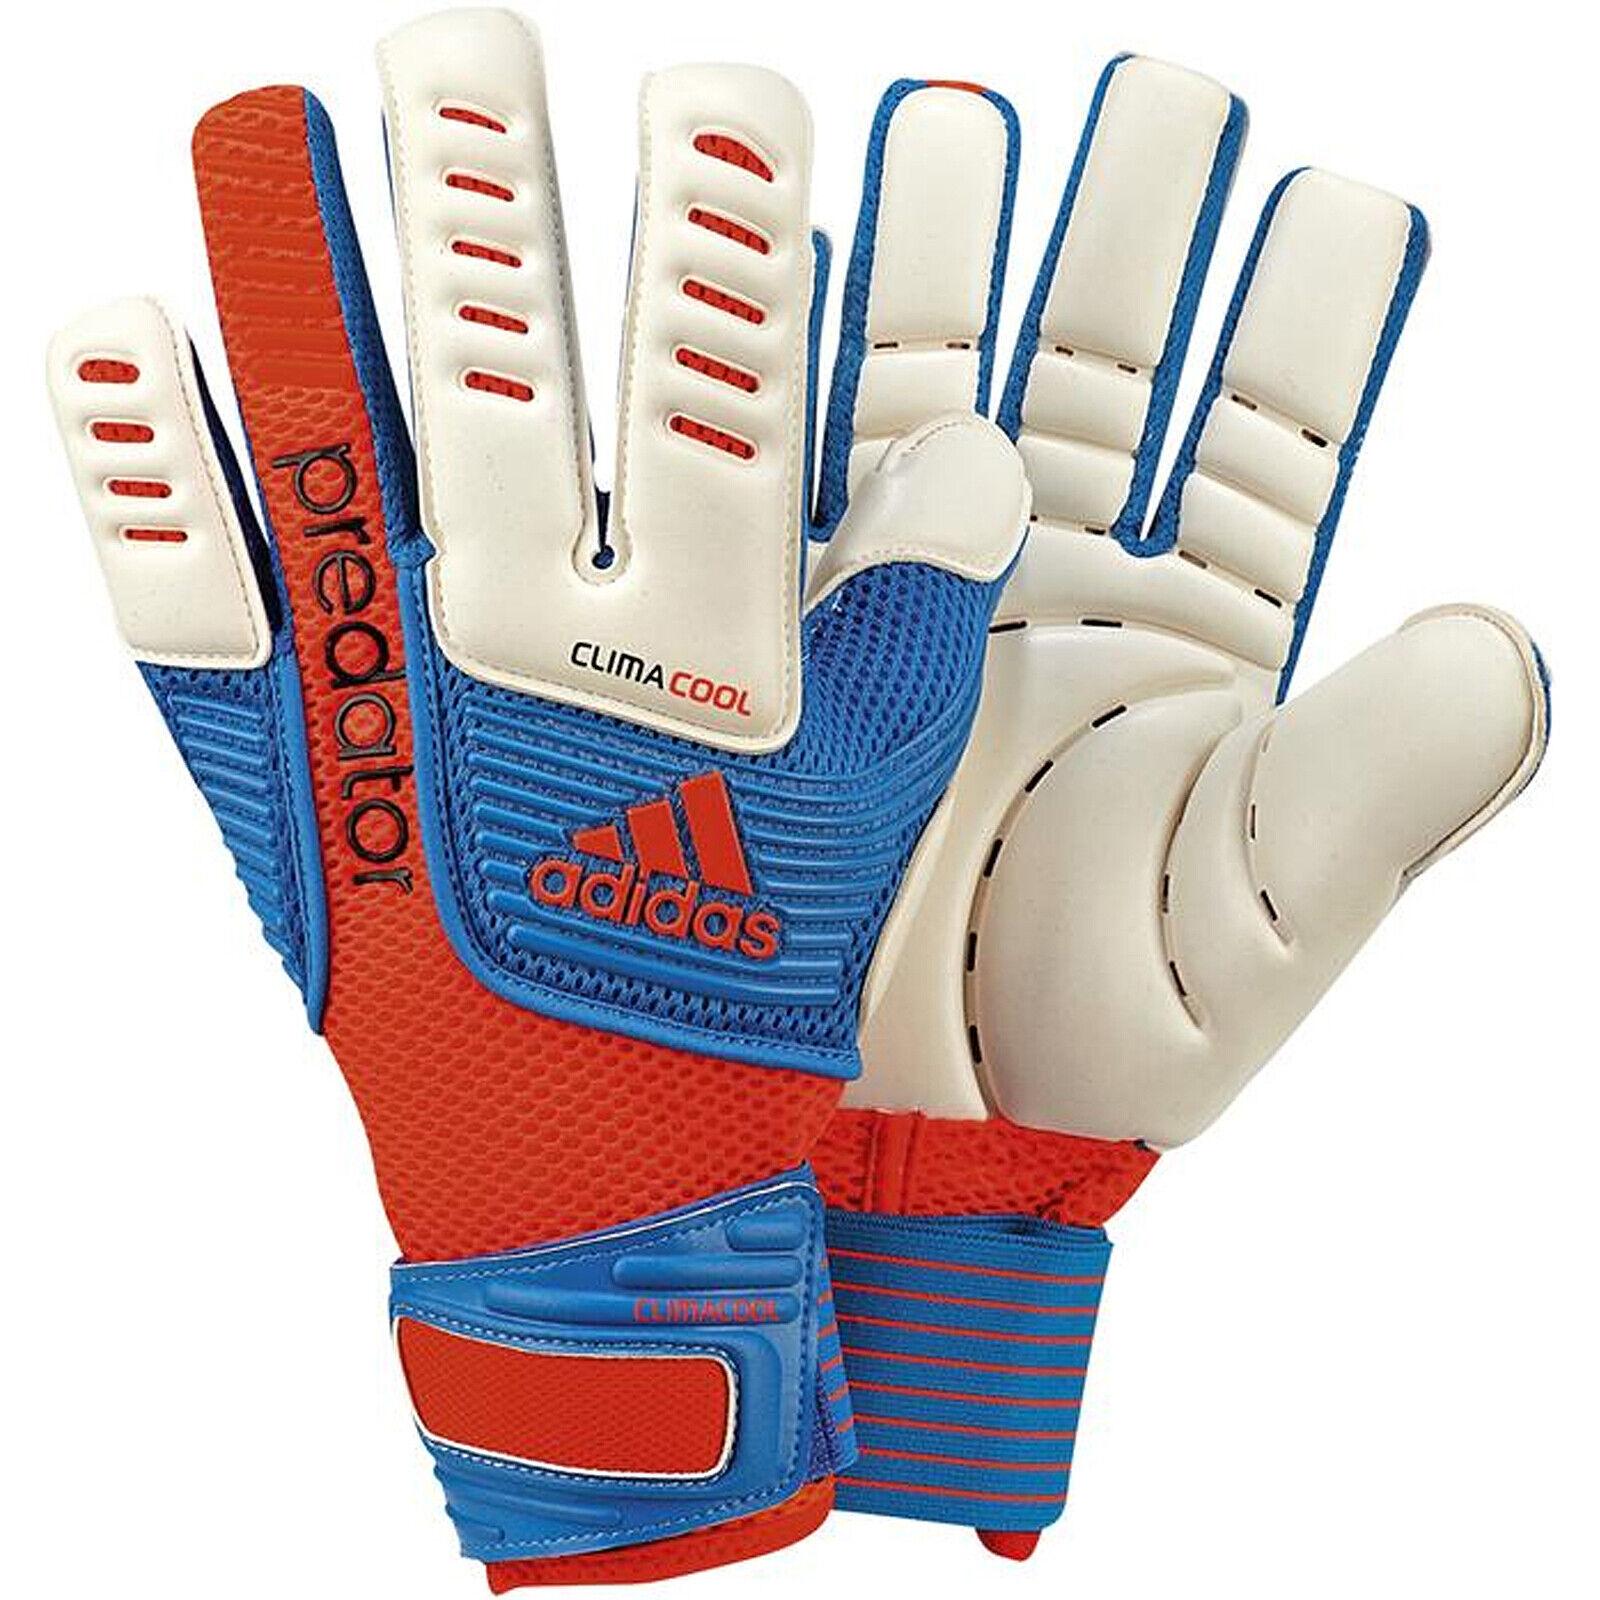 Adidas Performance Herren Protator pro Fußball Torwart Handschuhe - Blau